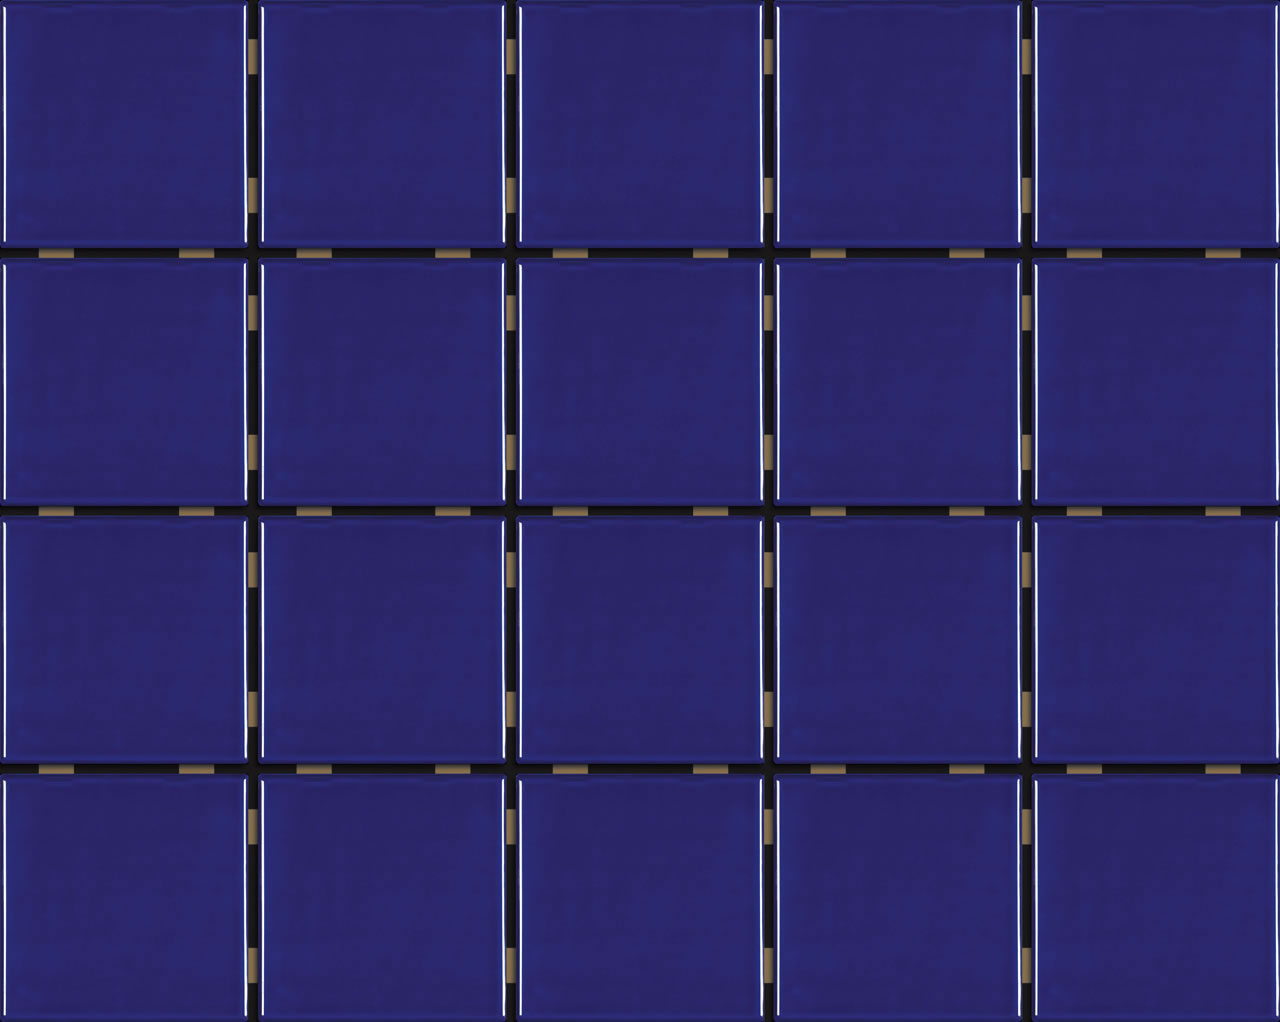 azul naval mesh